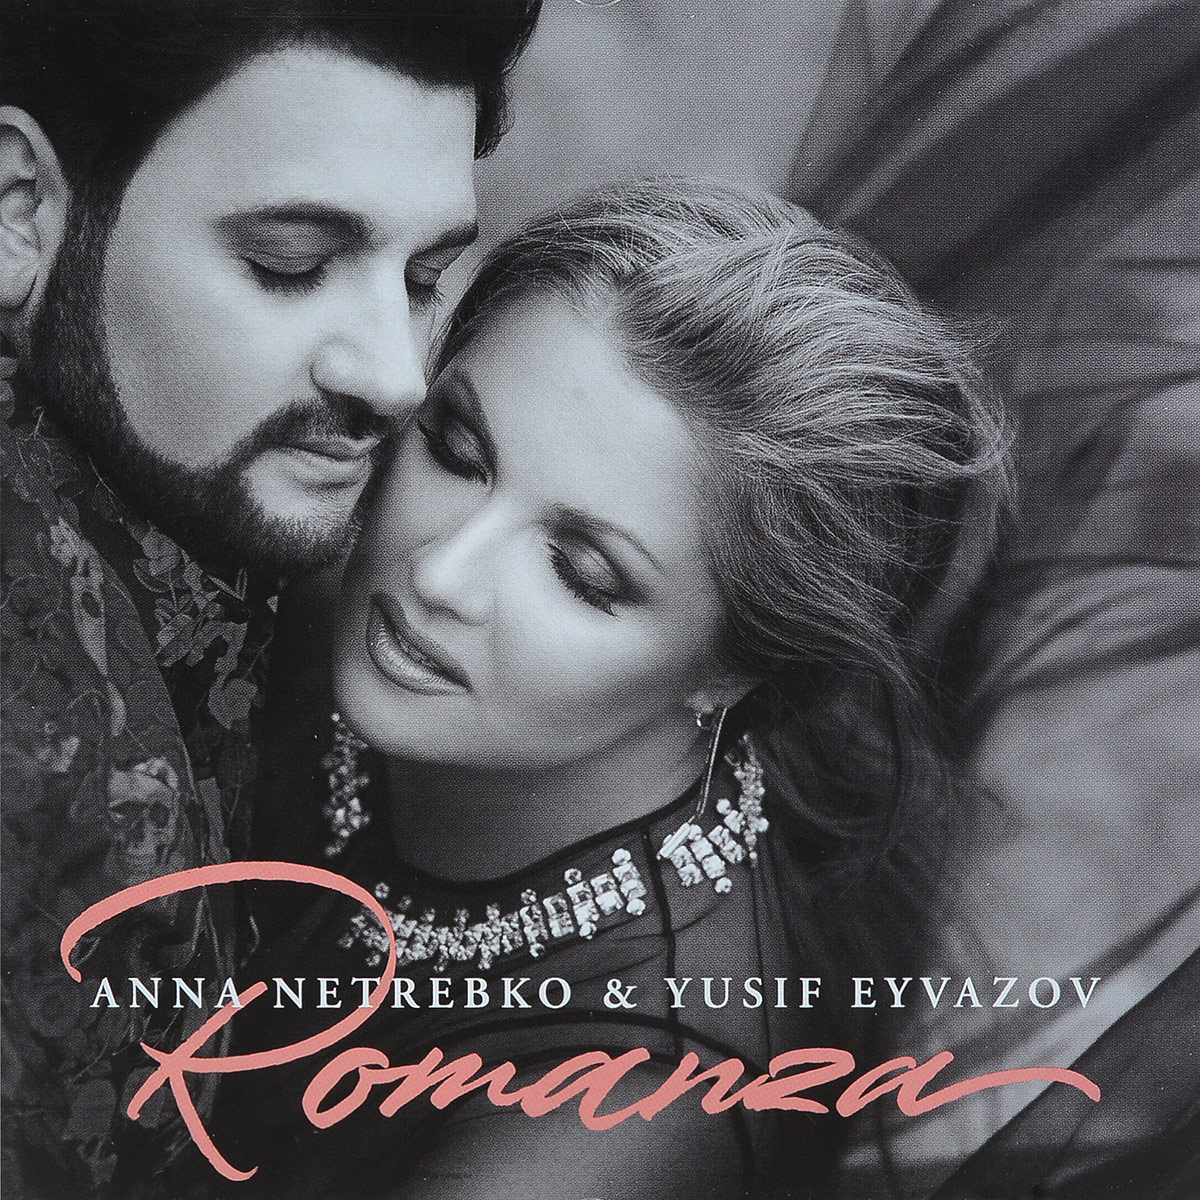 Анна Нетребко Anna Netrebko & Yusif Eyvazov. Romanza анна нетребко лондон